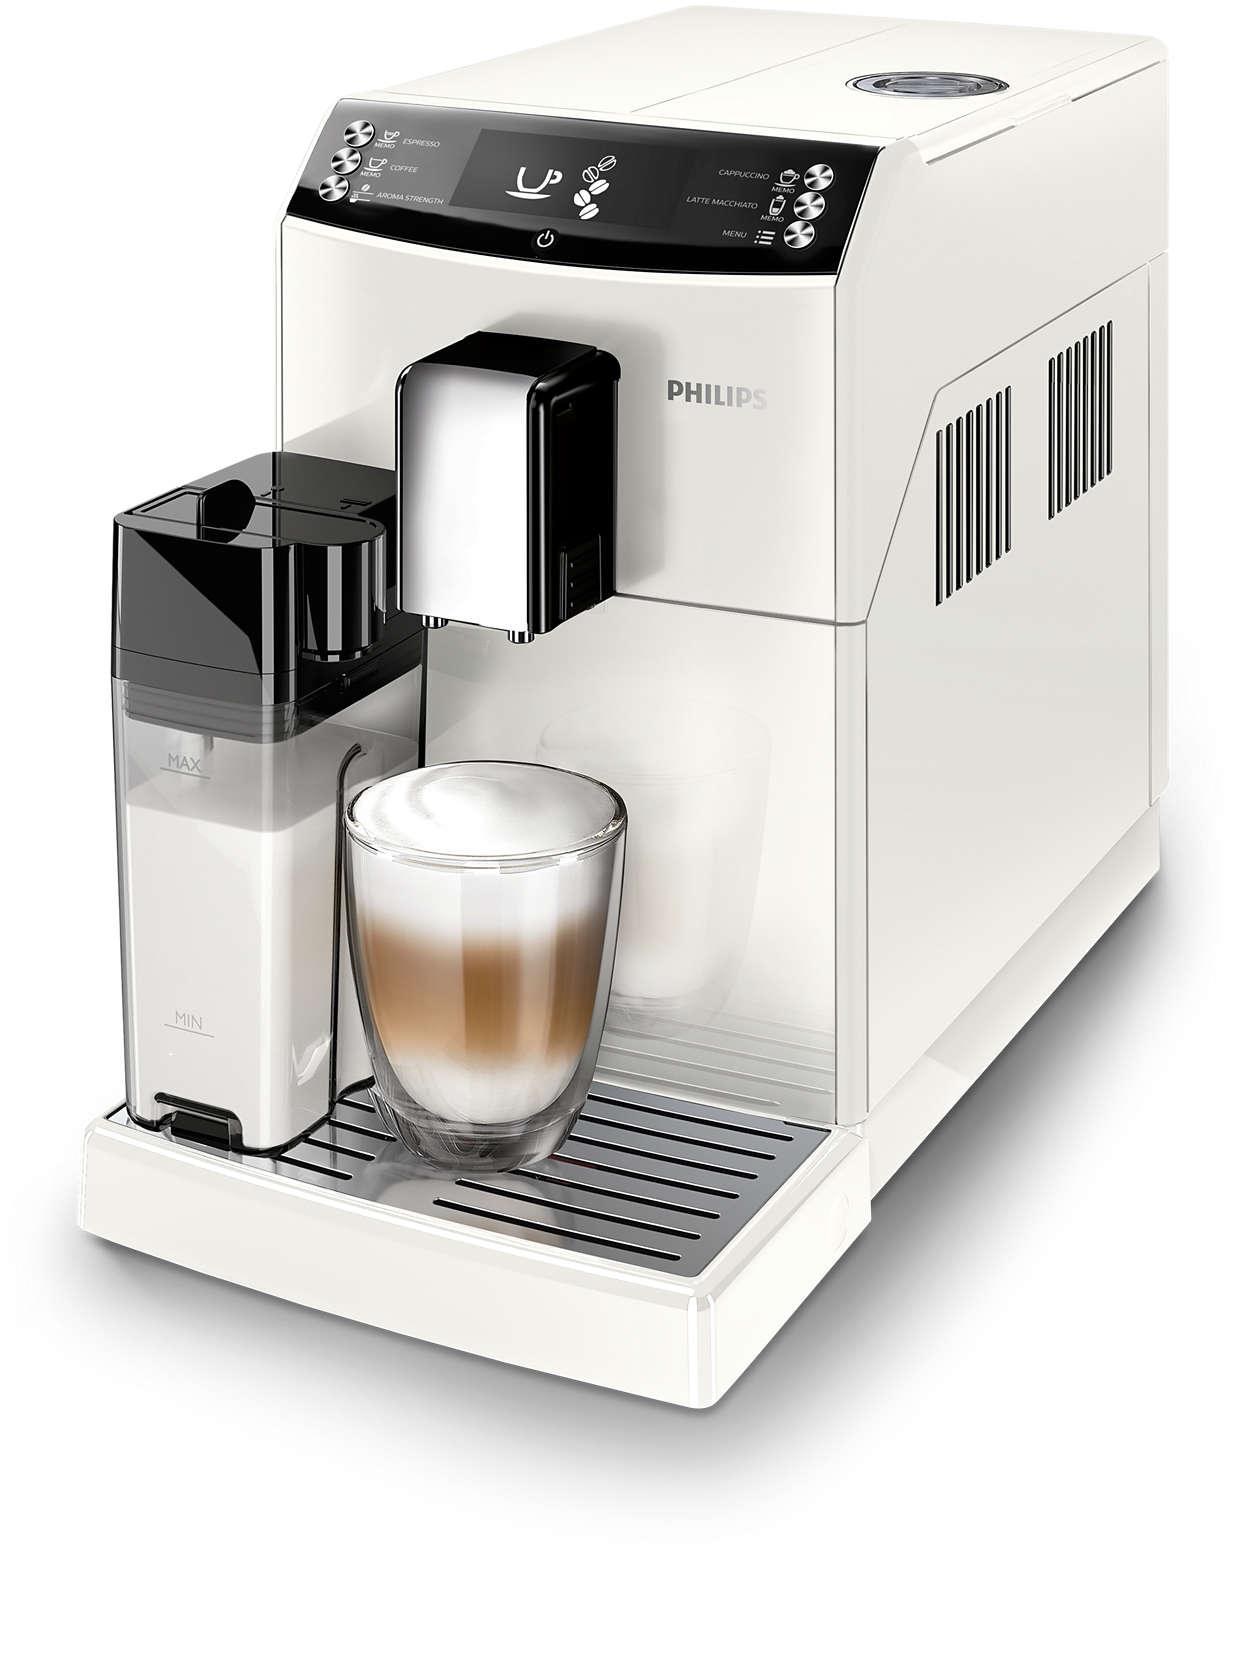 3100 series kaffeevollautomat ep3362 00 philips. Black Bedroom Furniture Sets. Home Design Ideas